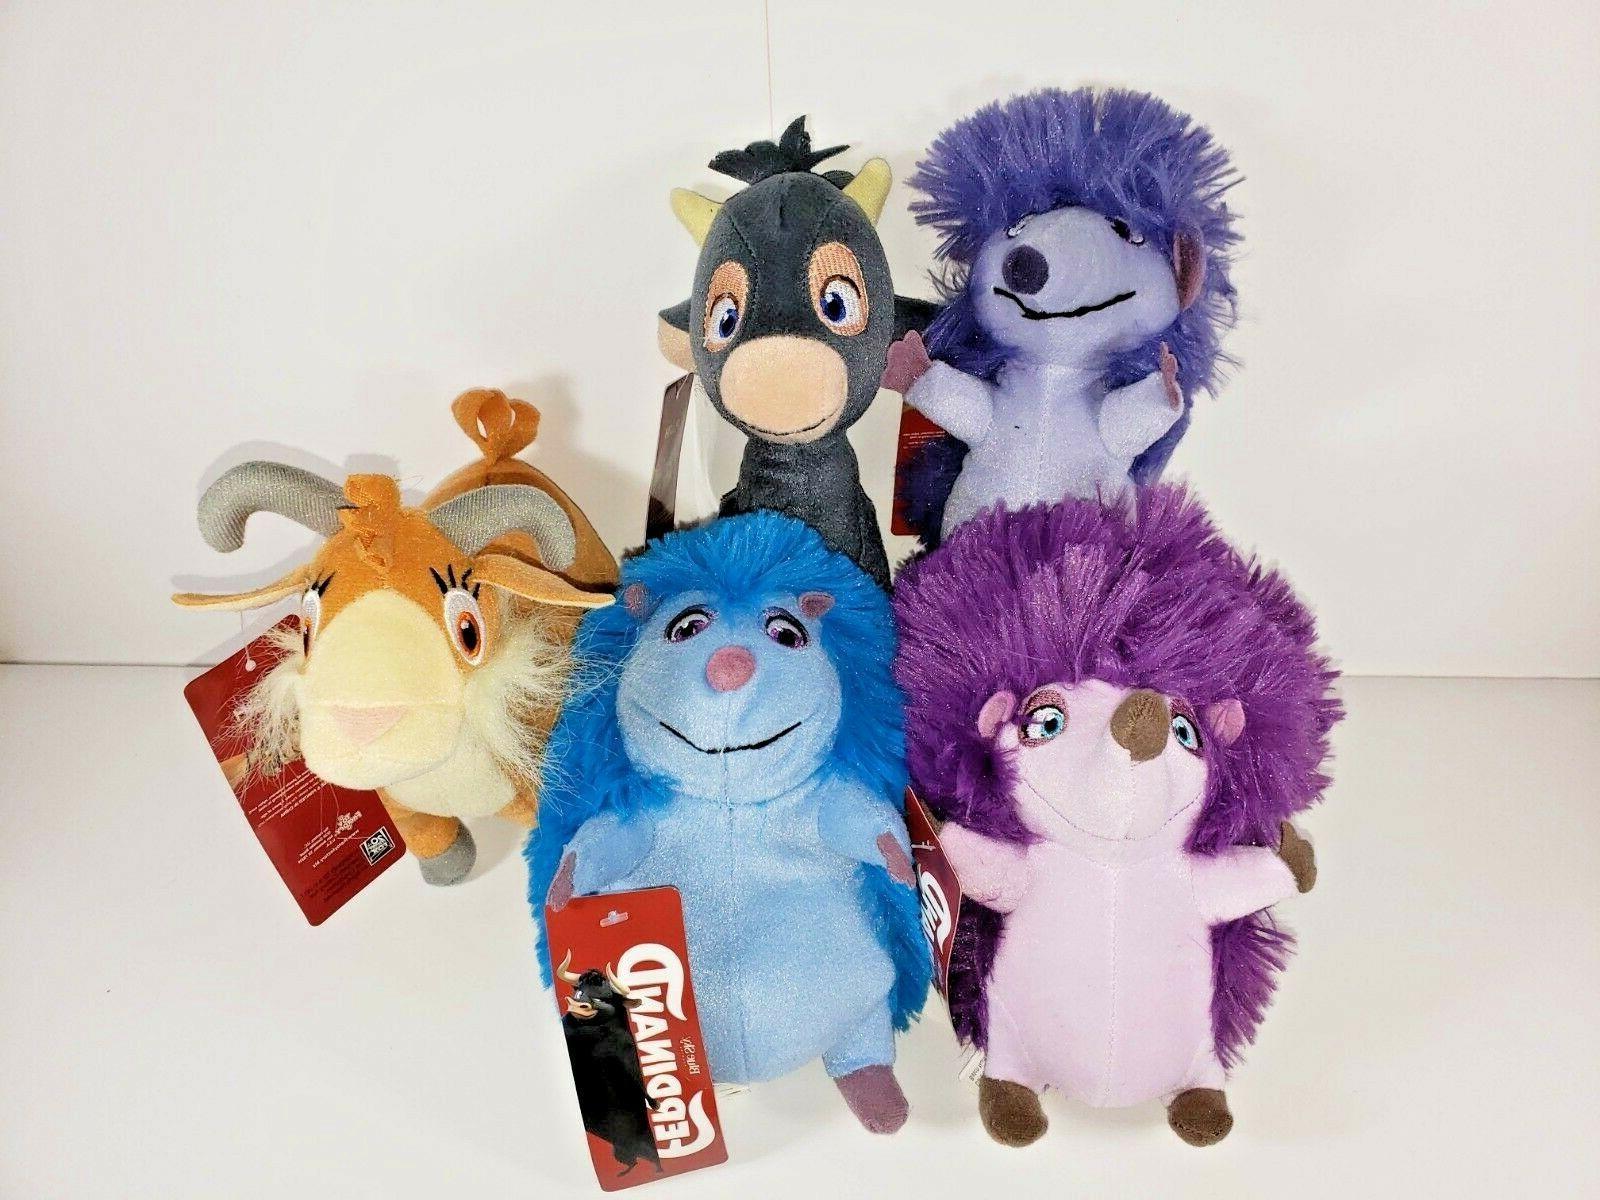 ferdinand plush stuffed animals assorted mini 6